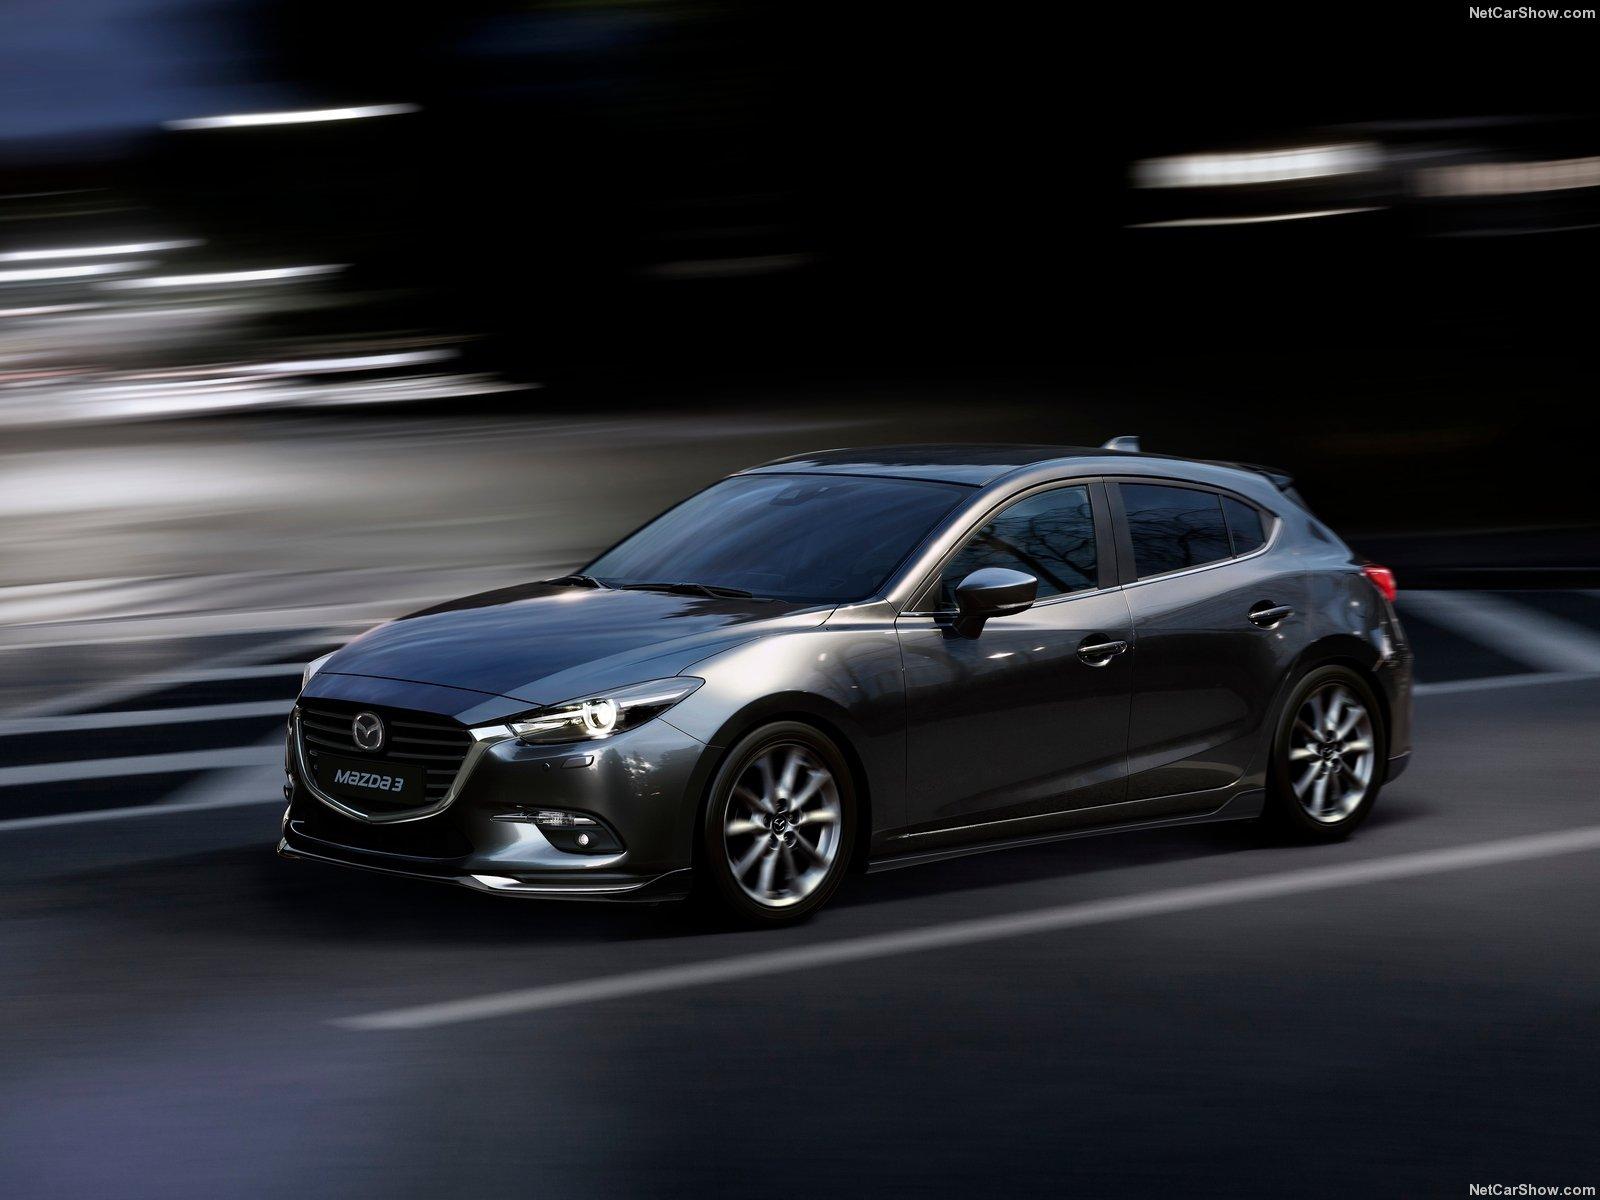 Mazda 3 2017 — фото, цены, комплектации и характеристики